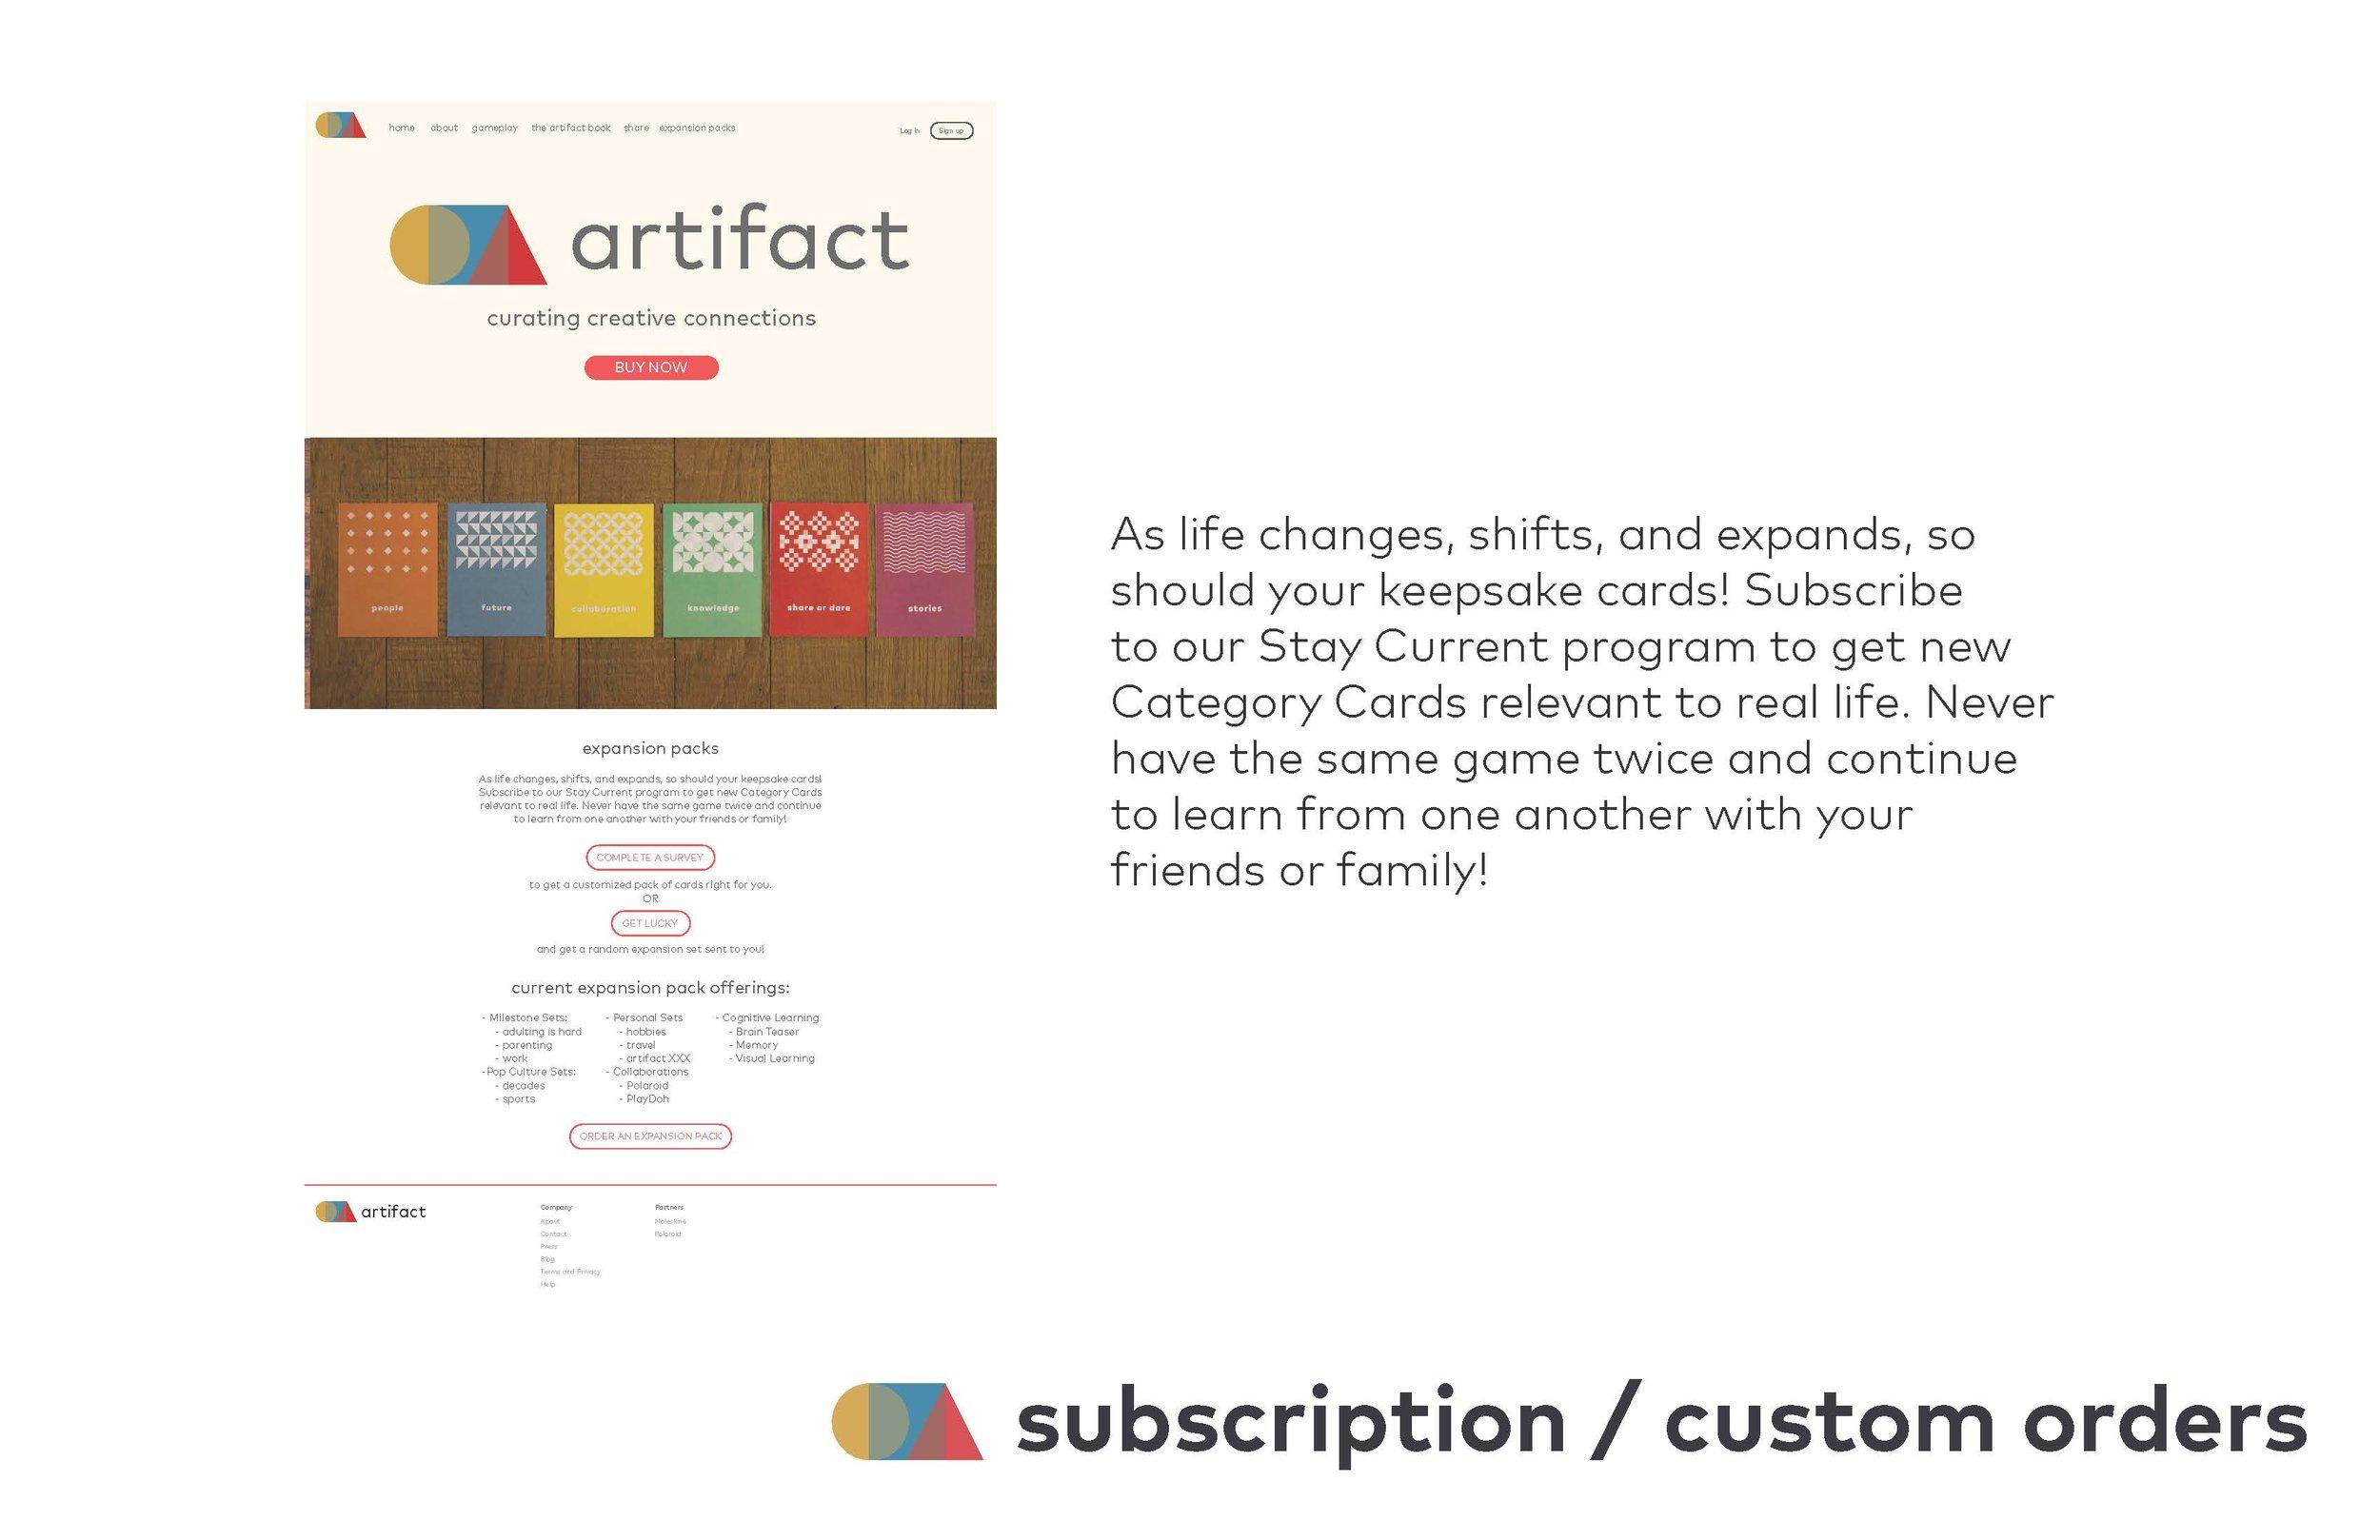 ArtifactFinalPresentation-1_Page_23.jpg